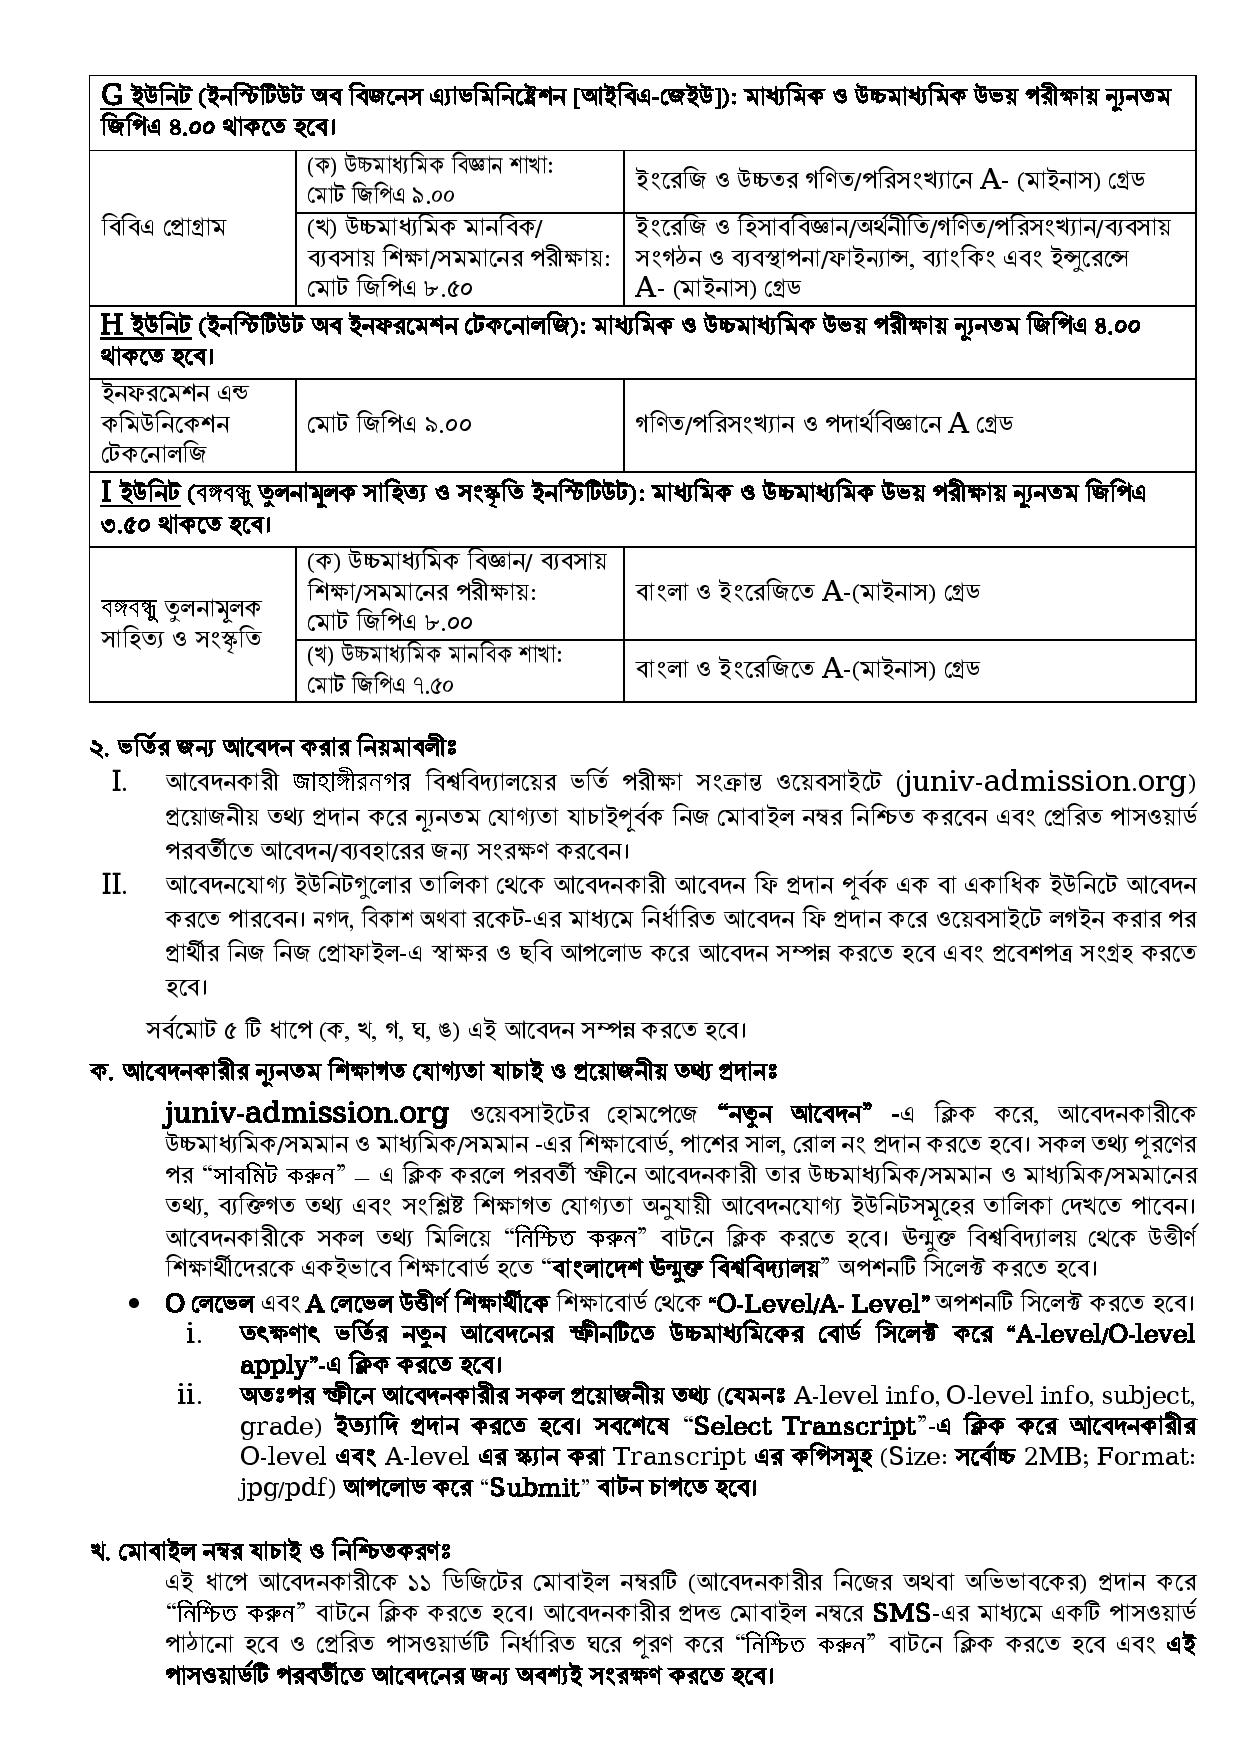 JU-Admission-2020-21-page-003